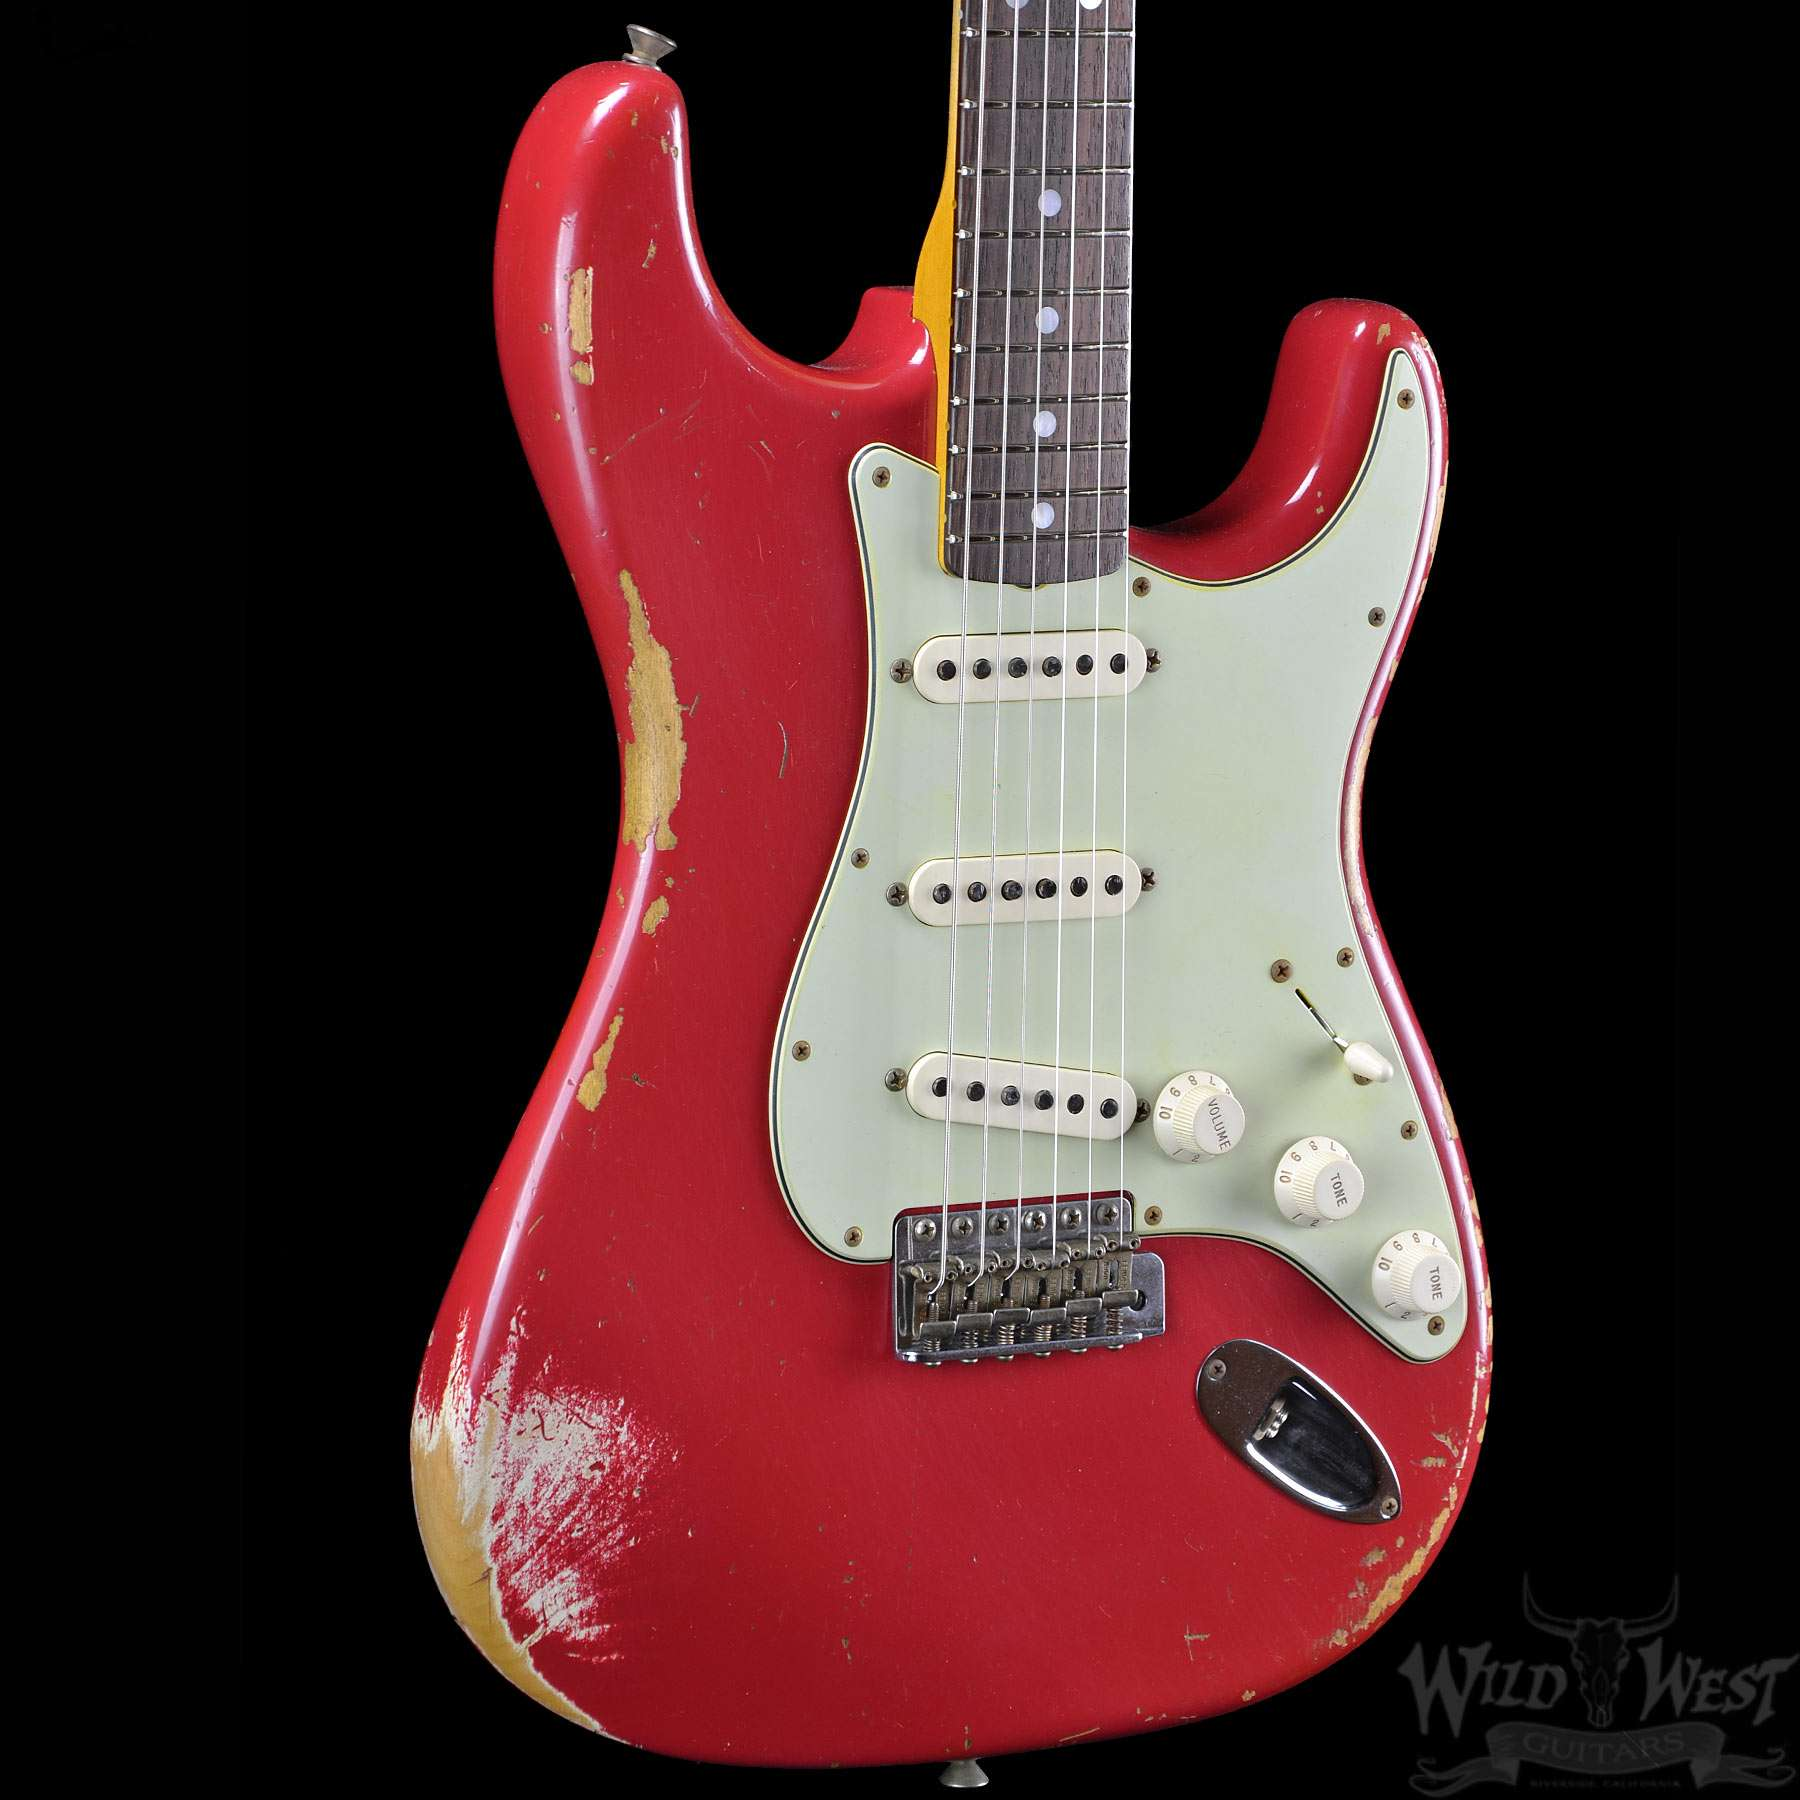 fender 1965 stratocaster heavy relic dakota red wild west guitars. Black Bedroom Furniture Sets. Home Design Ideas